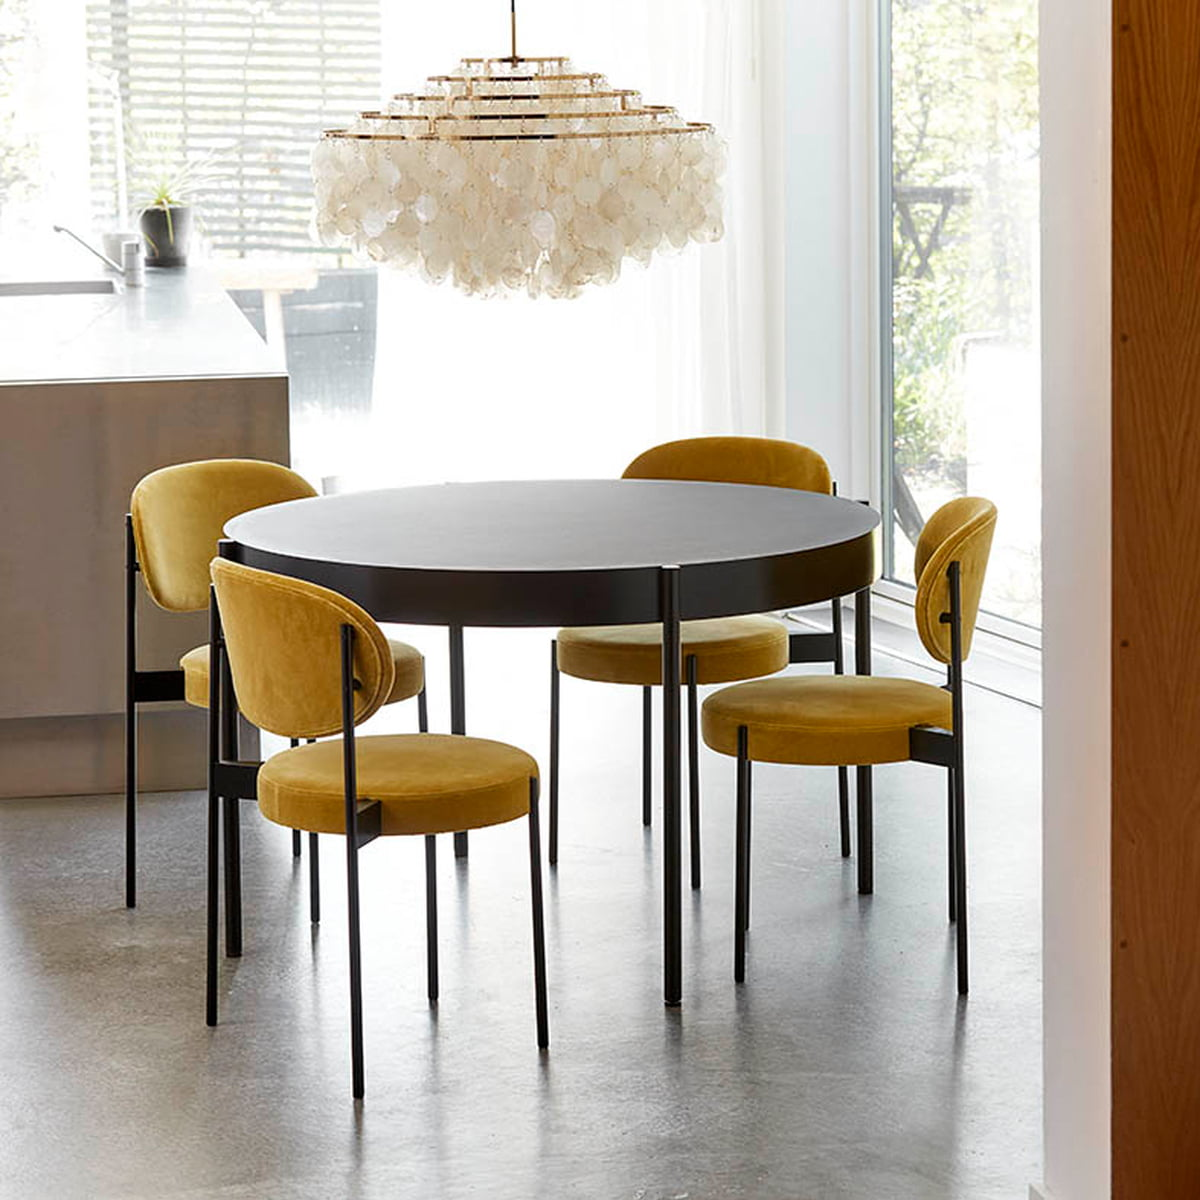 Padded 430 Chair By Verner Panton